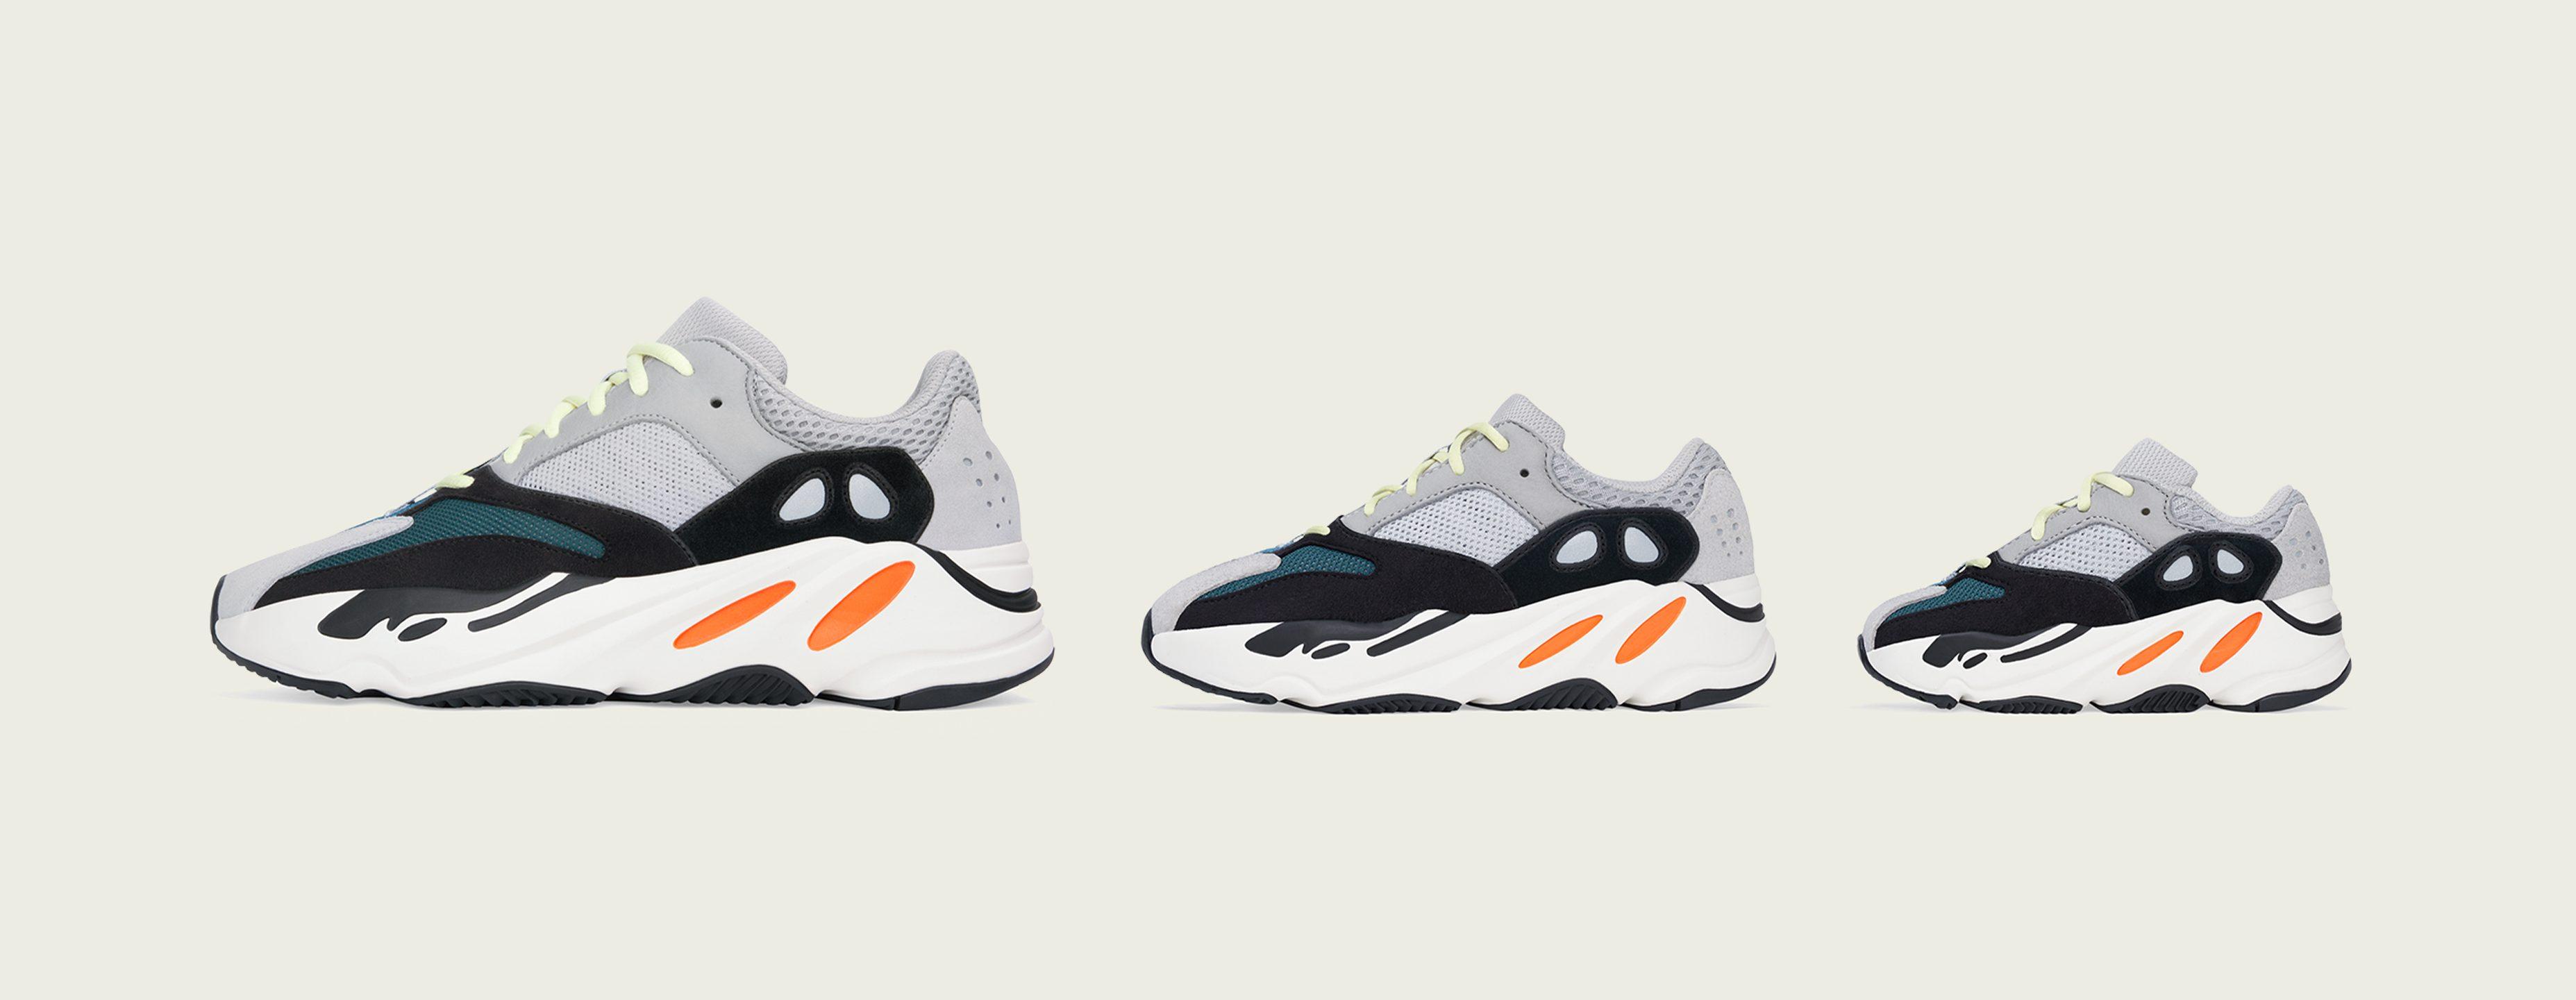 Adidas Yeezy Boost 700 'Wave Runner